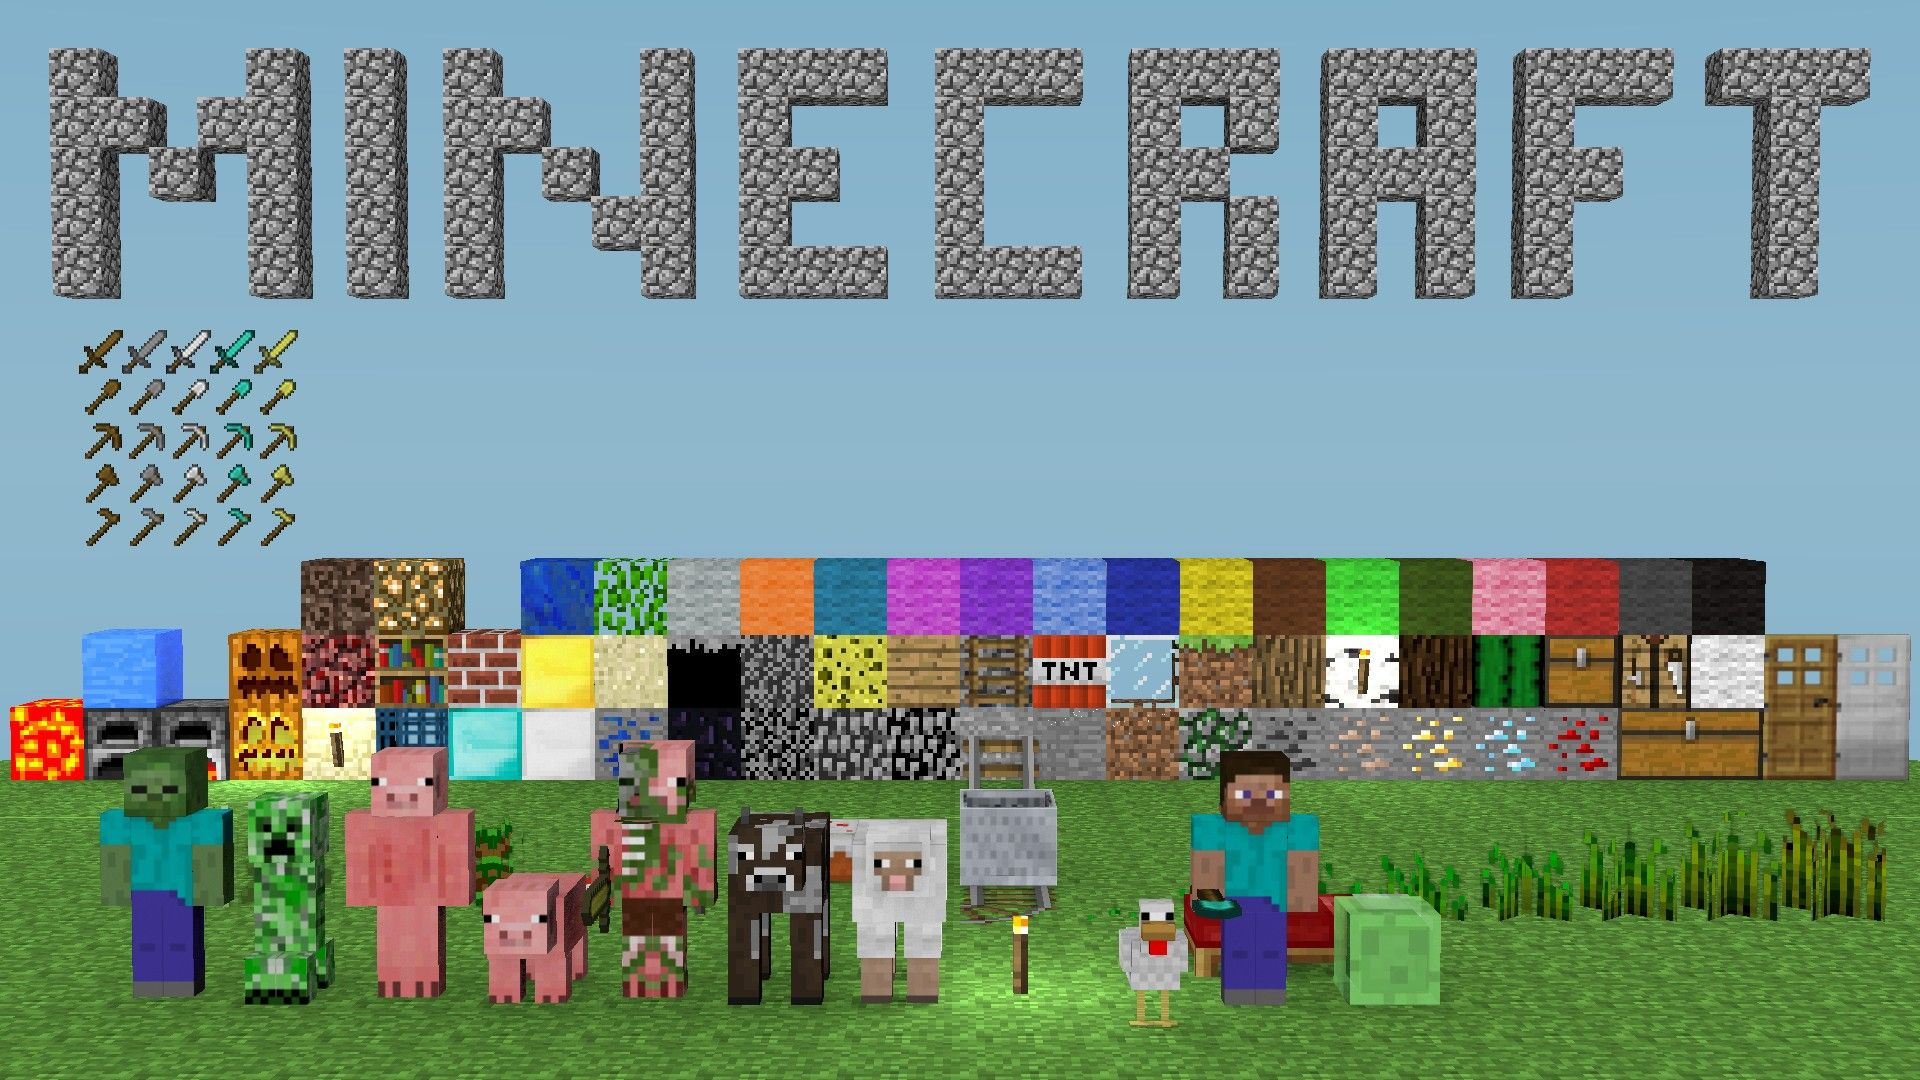 Good Wallpaper Minecraft Poster - 9f0cb4396197d4d9a945146b4df71fae  Gallery_949164.jpg